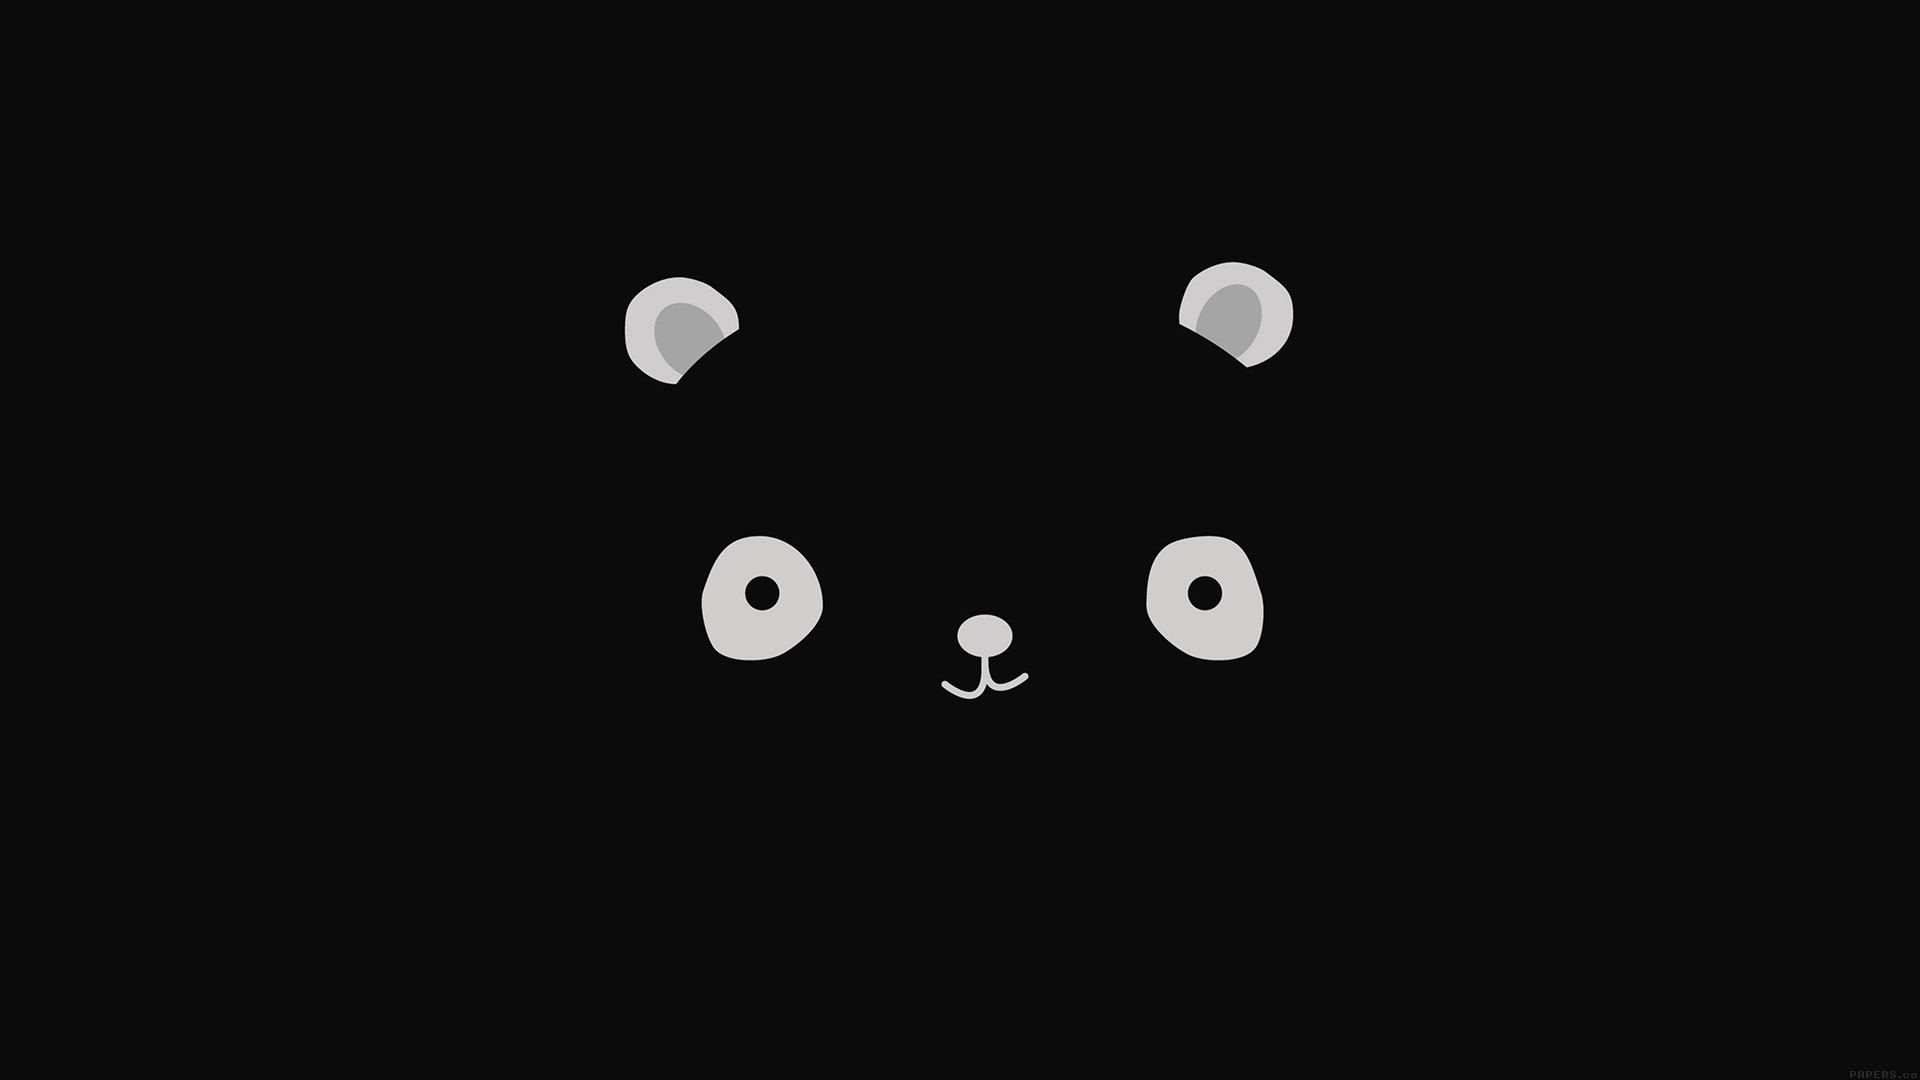 Ag17-cute-minimal-panda-dark-illust-art